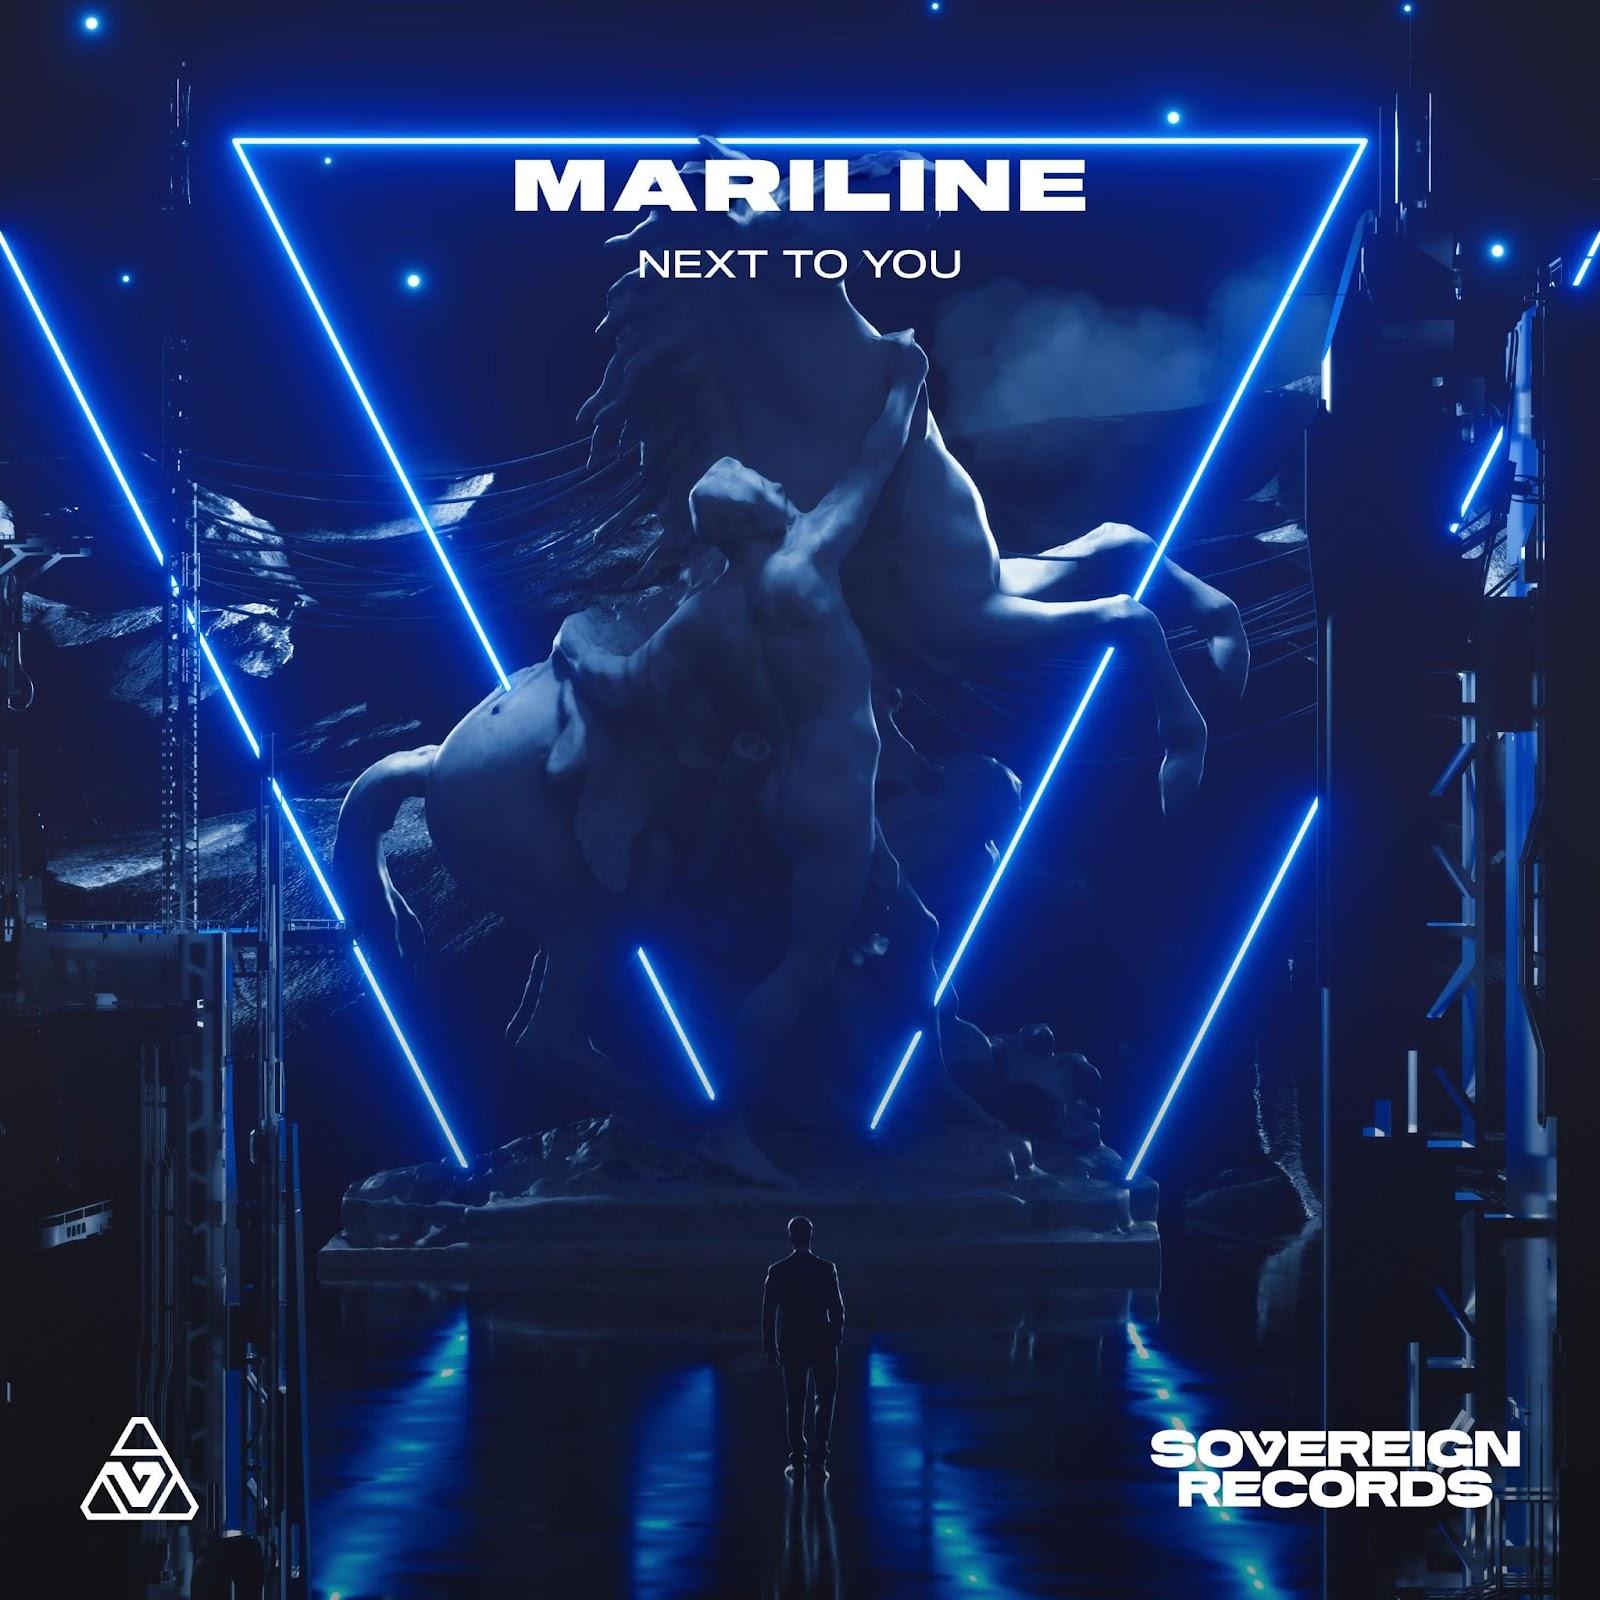 Mariline